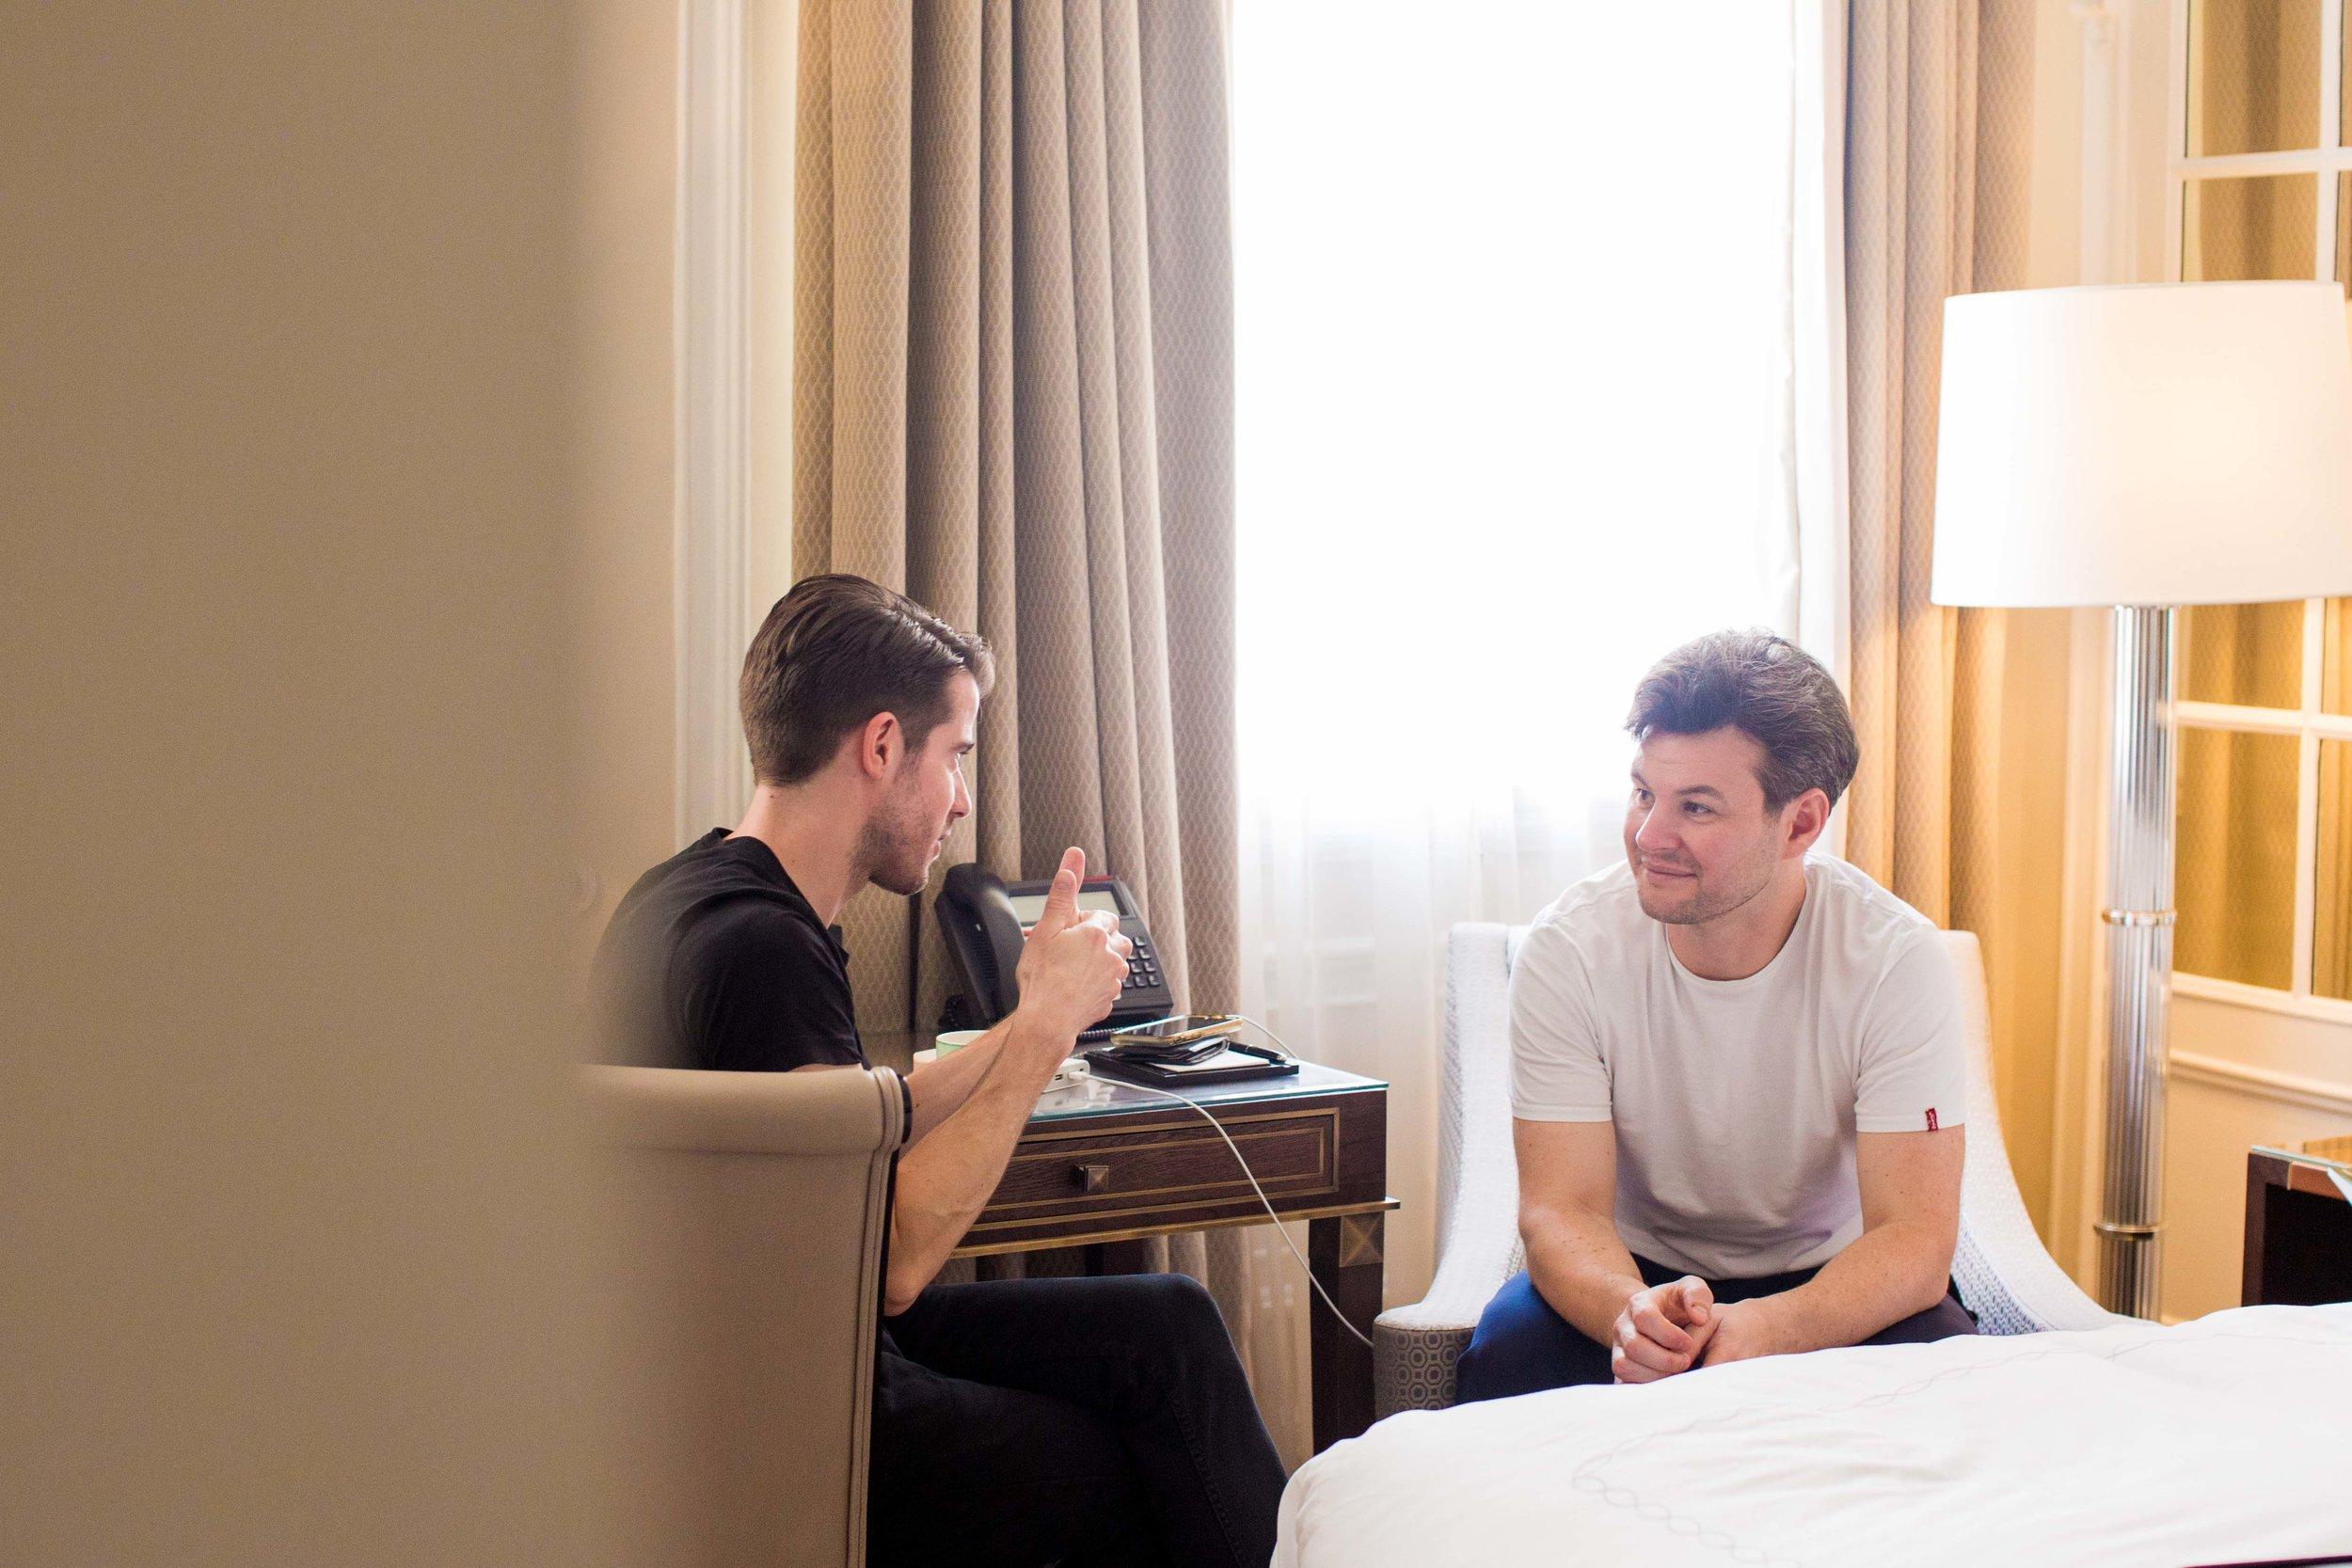 claridges-hotel-wedding-photographer-london-mayfair-natalia-smith-photography-18.jpg